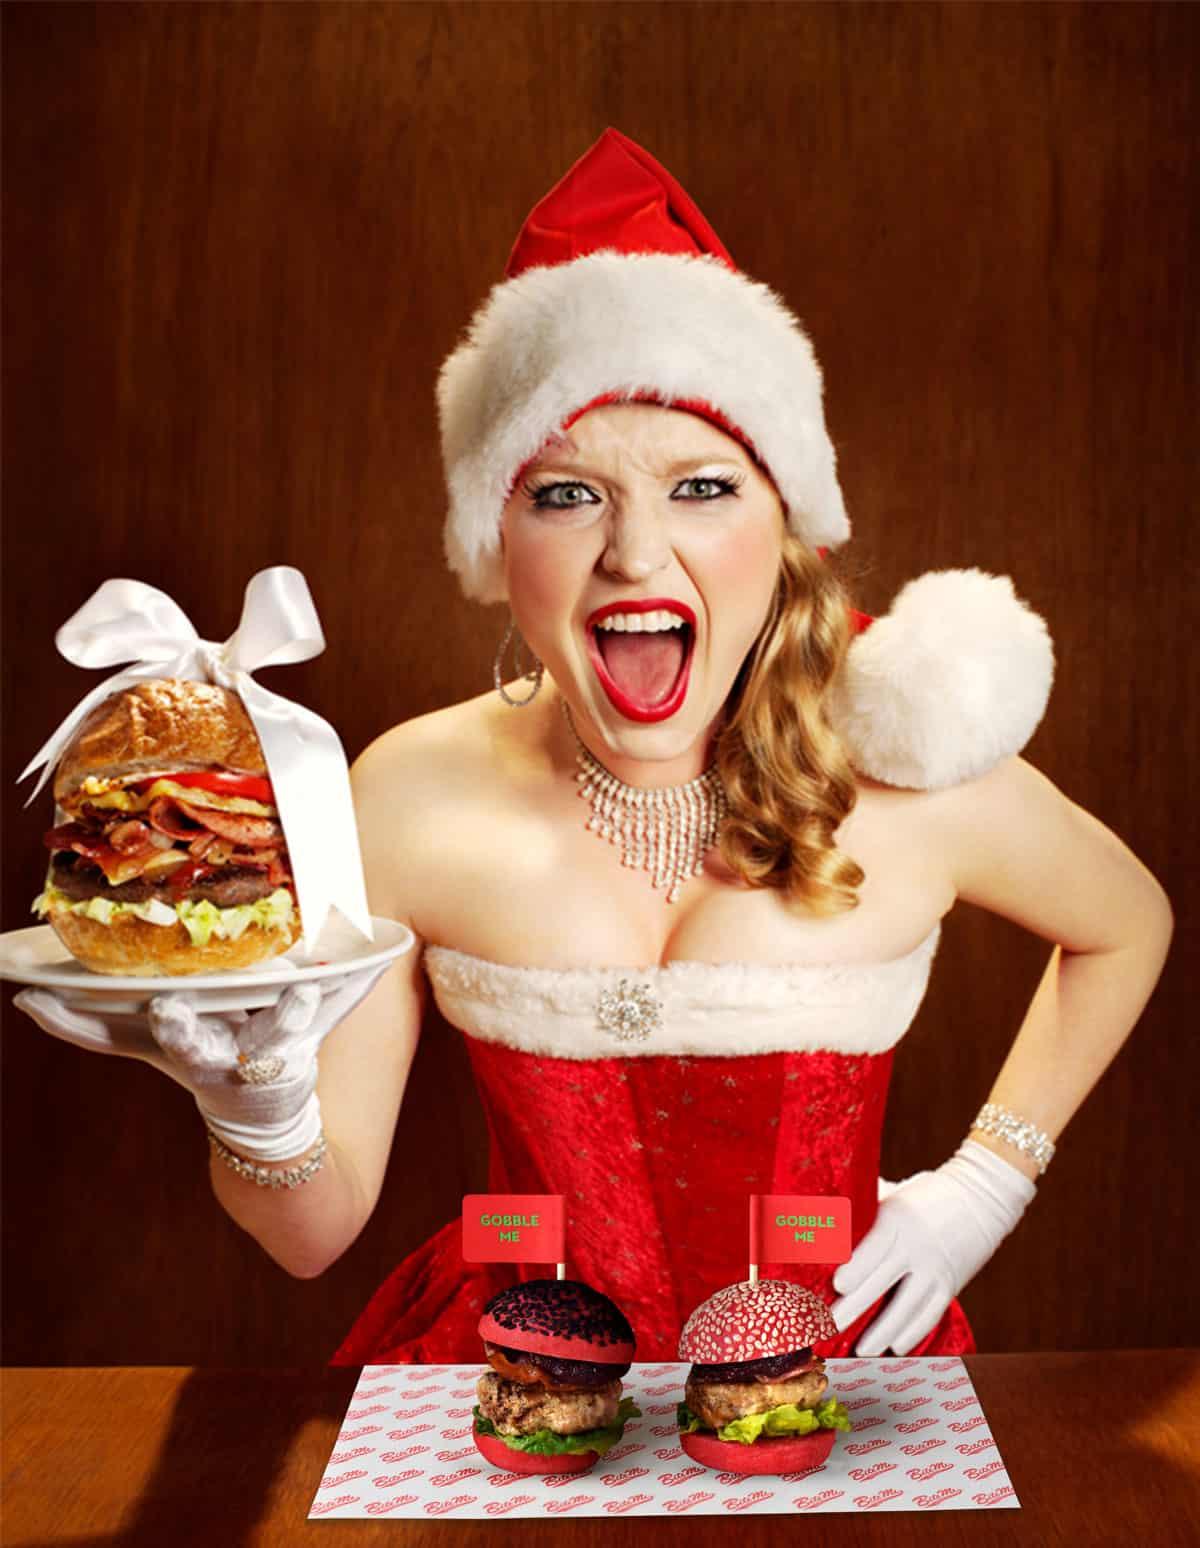 Christmas with burgers